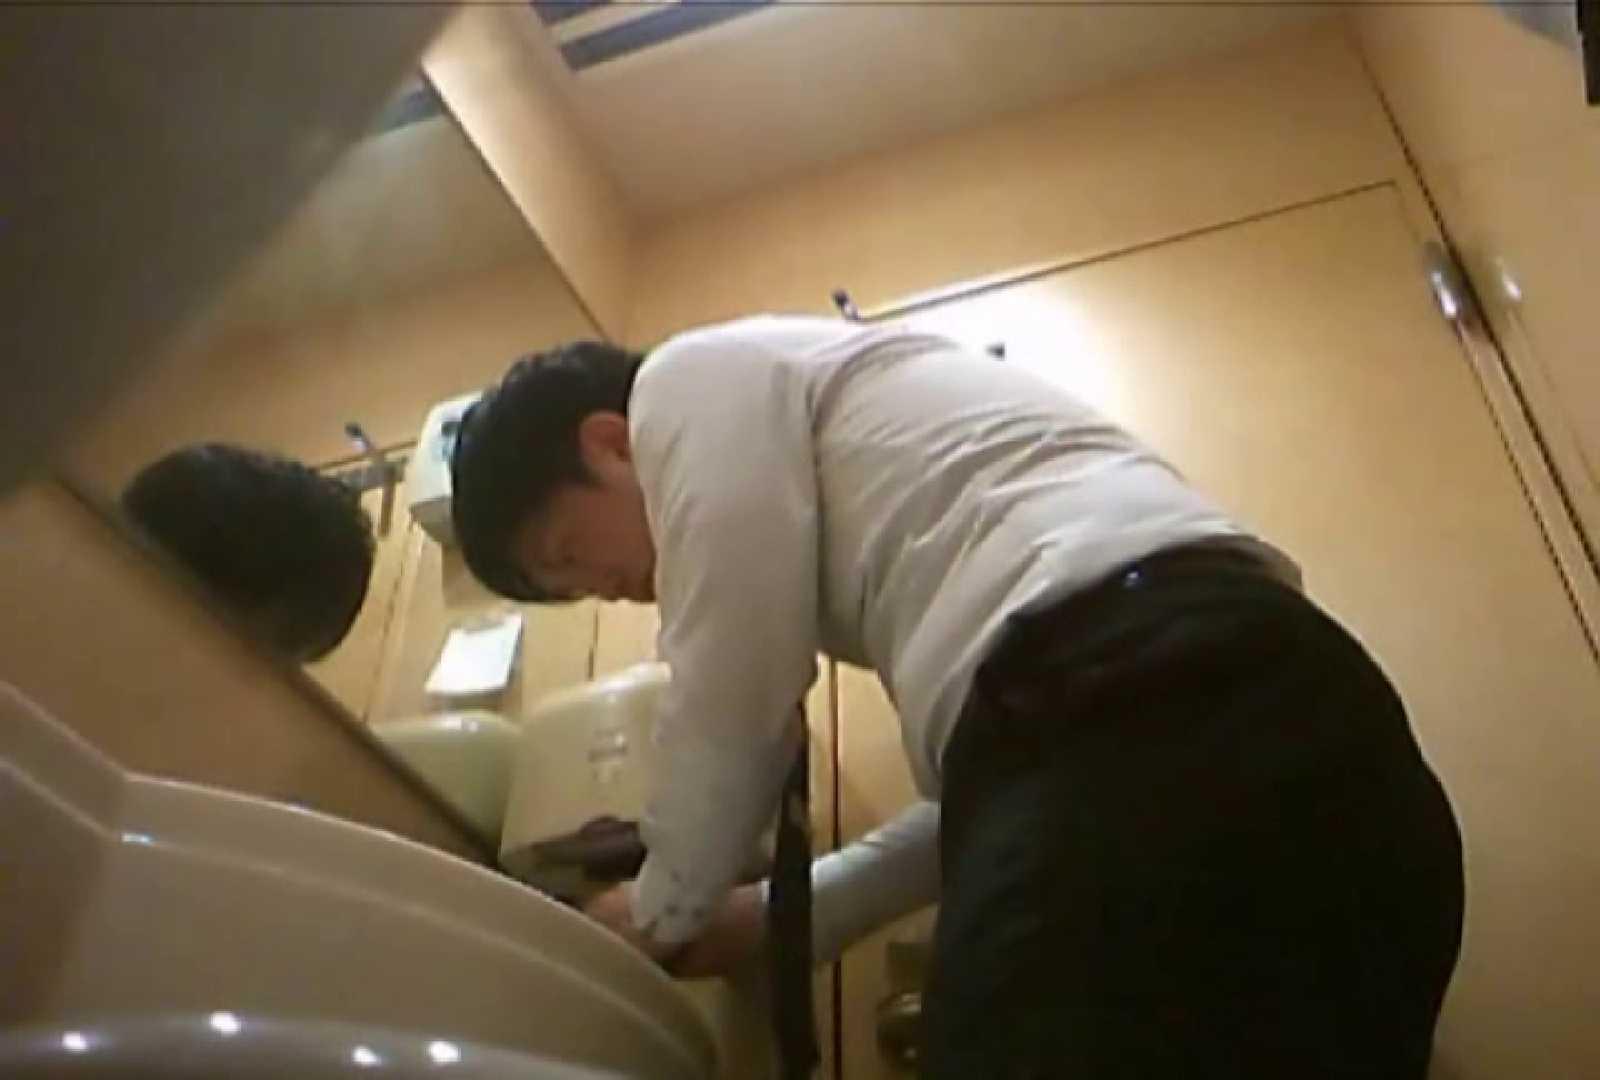 SEASON 3rd!掴み取りさんの洗面所覗き!in新幹線!VOL.23 完全無修正  81pic 72